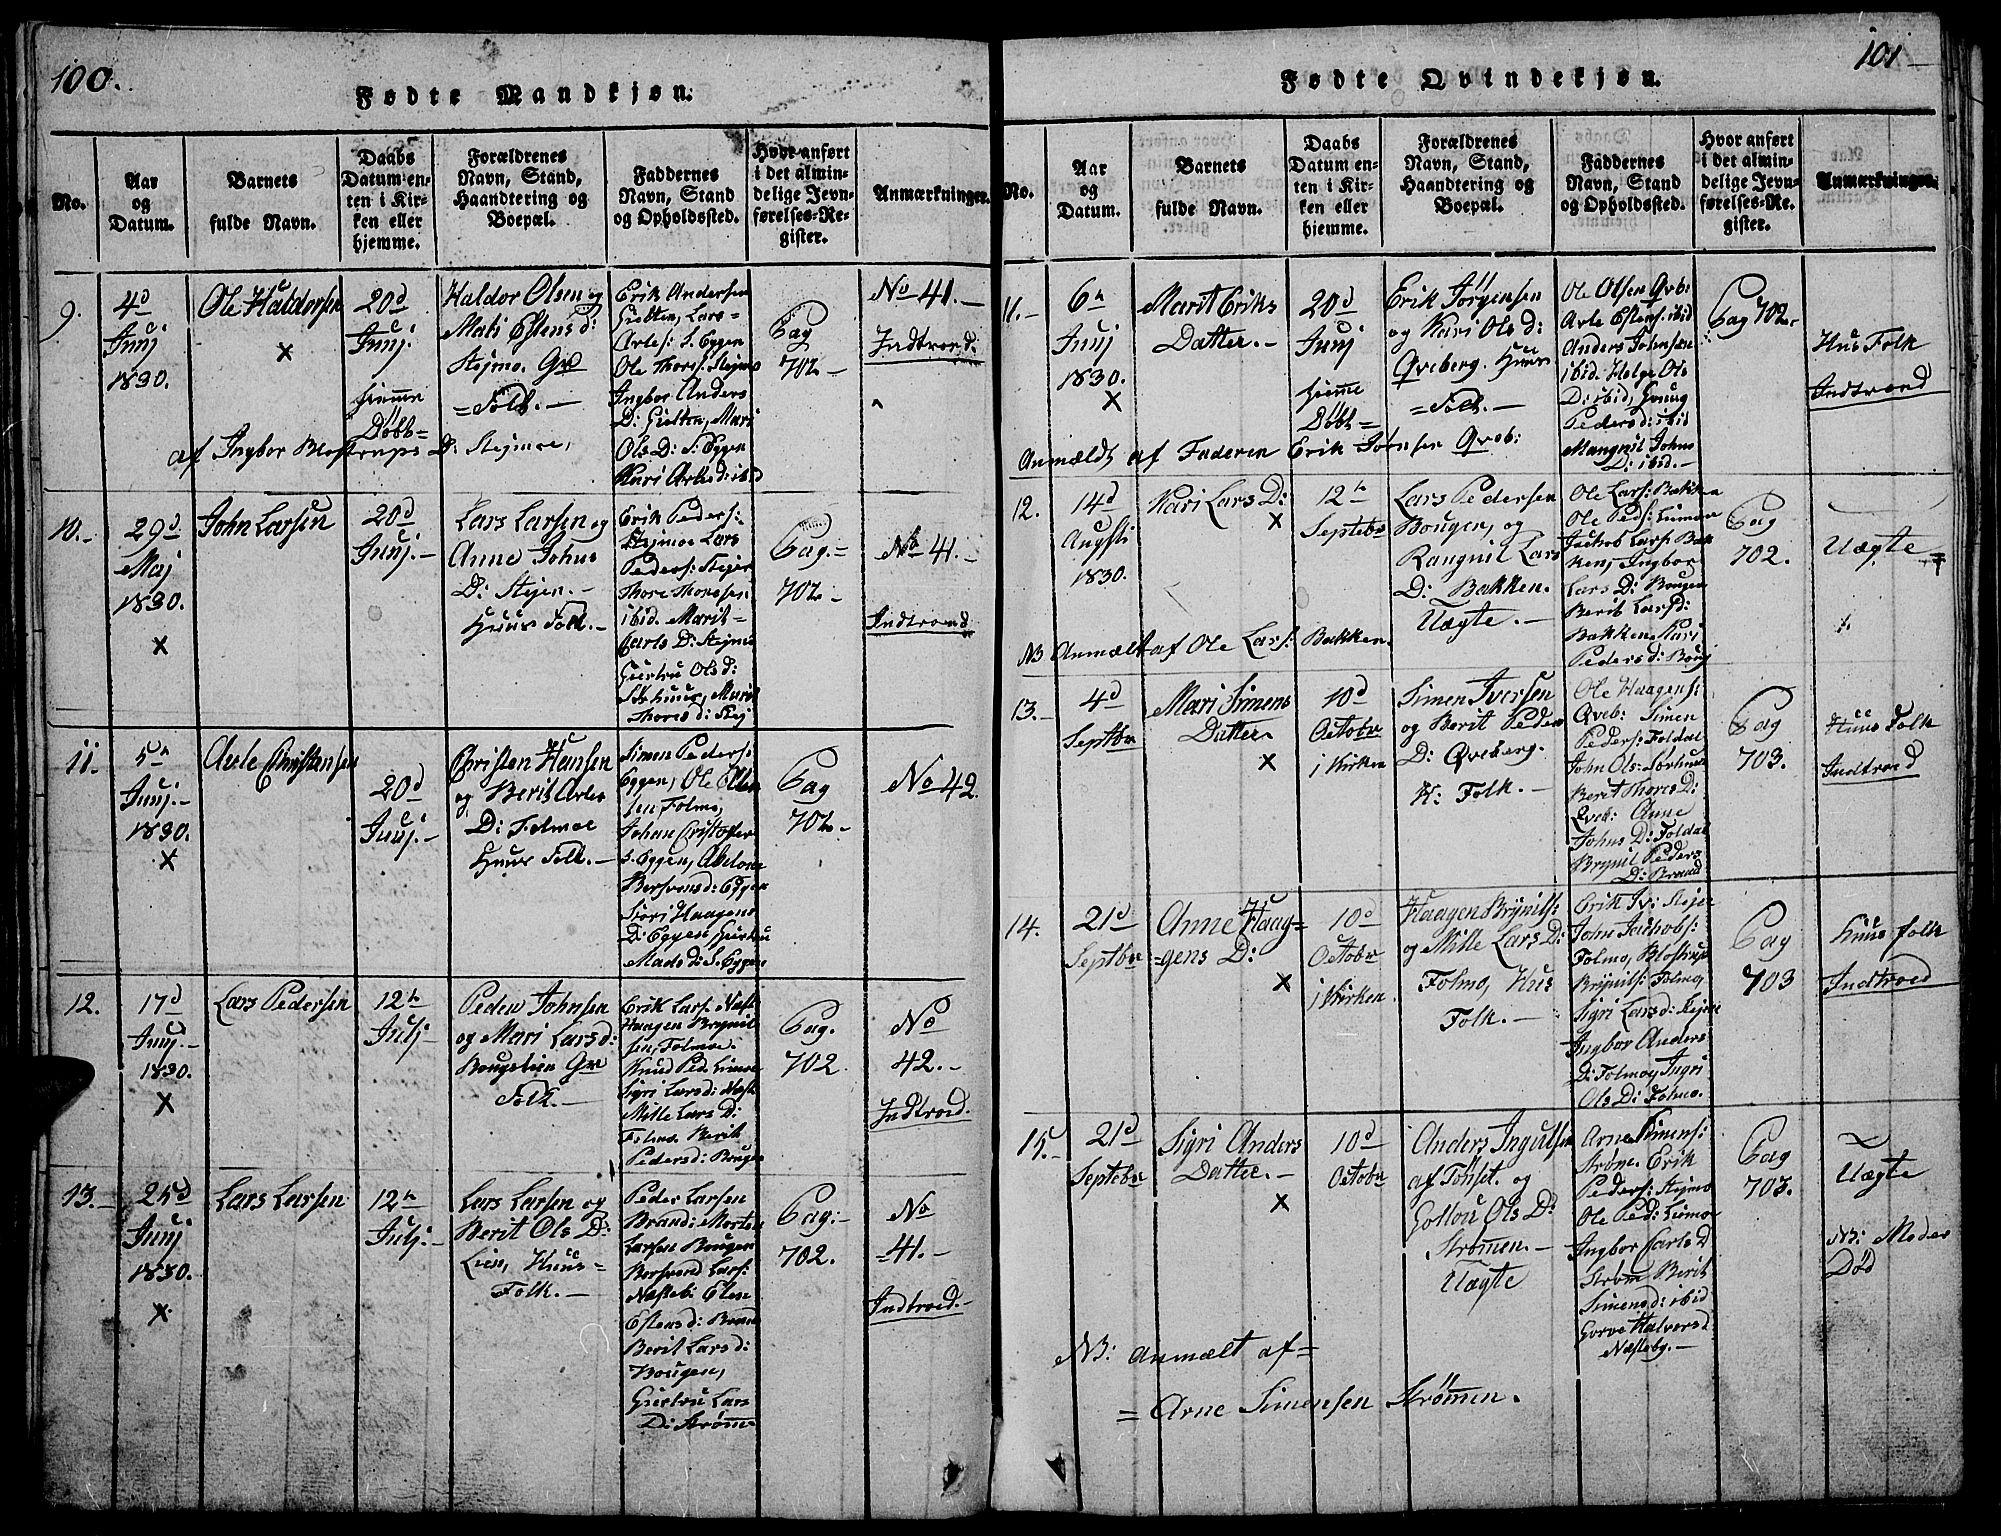 SAH, Tynset prestekontor, Klokkerbok nr. 2, 1814-1862, s. 100-101